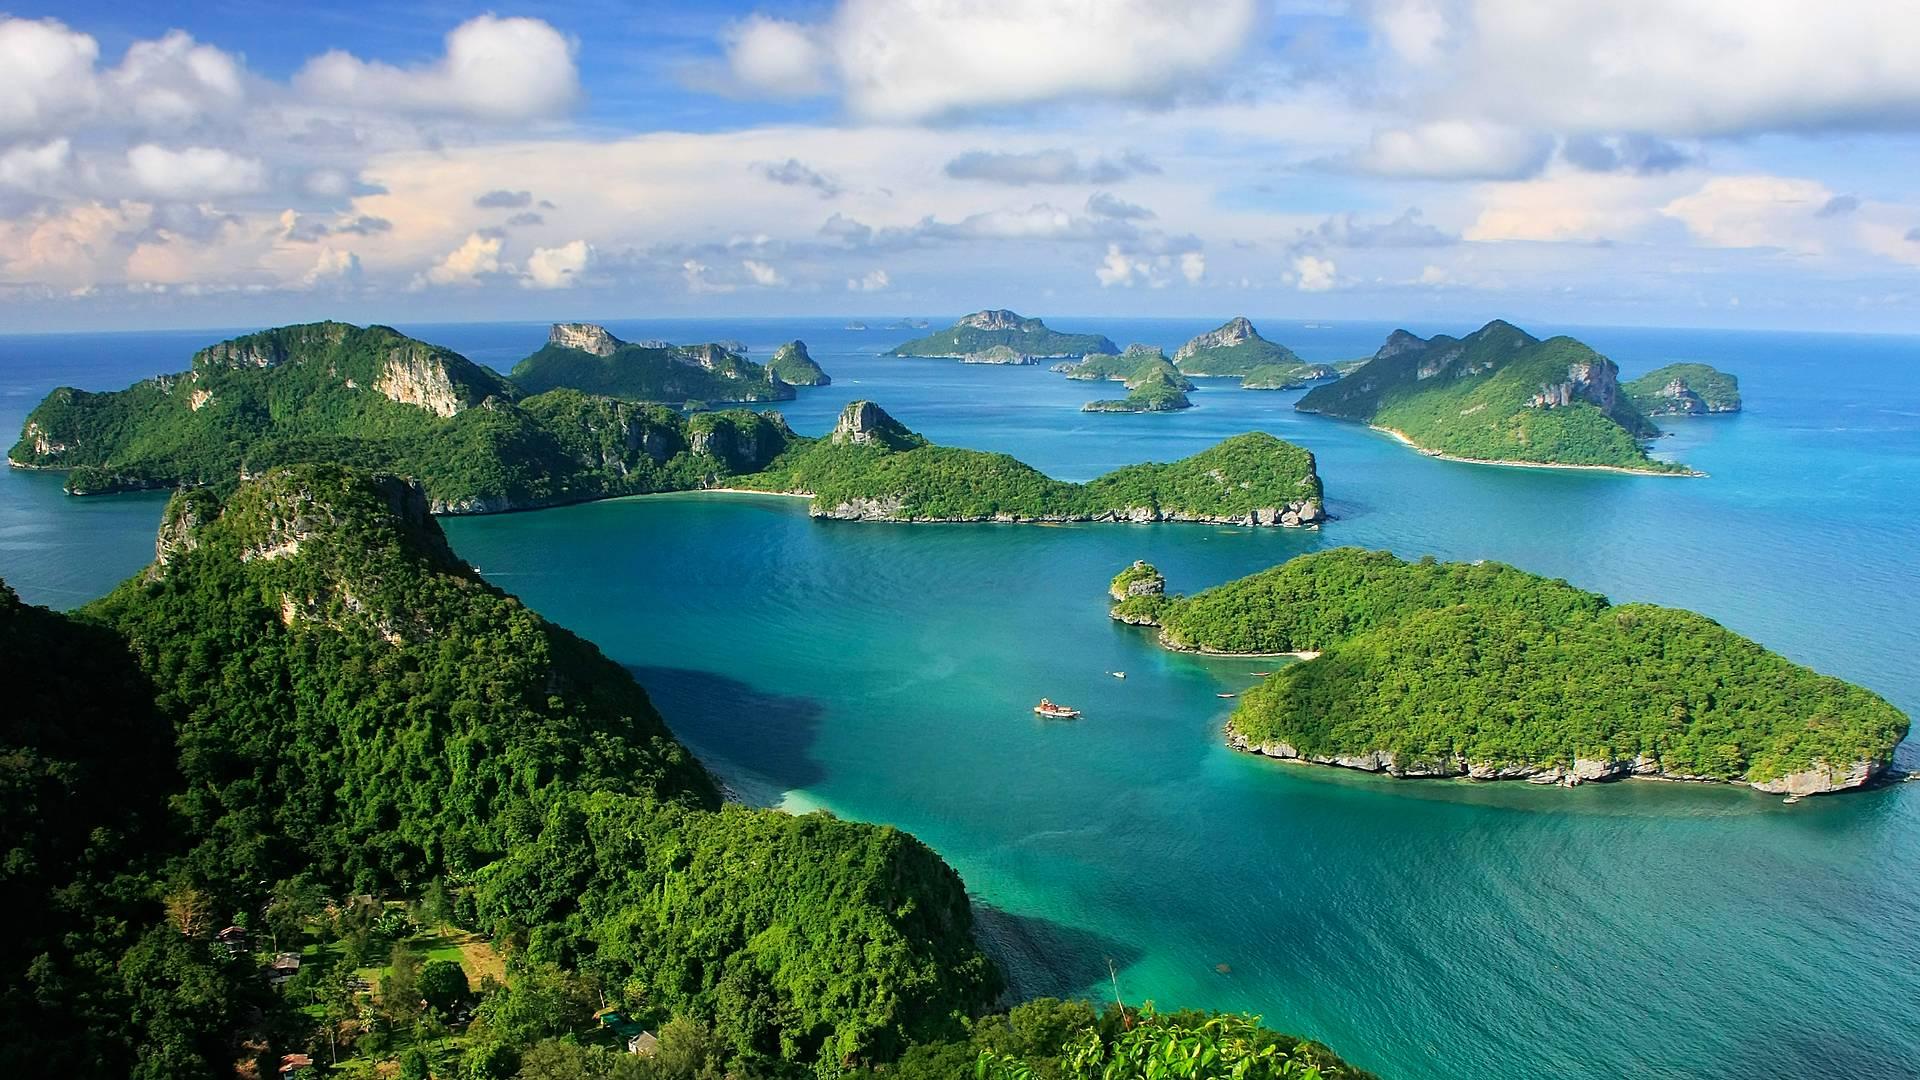 Bangkok e le isole del Golfo